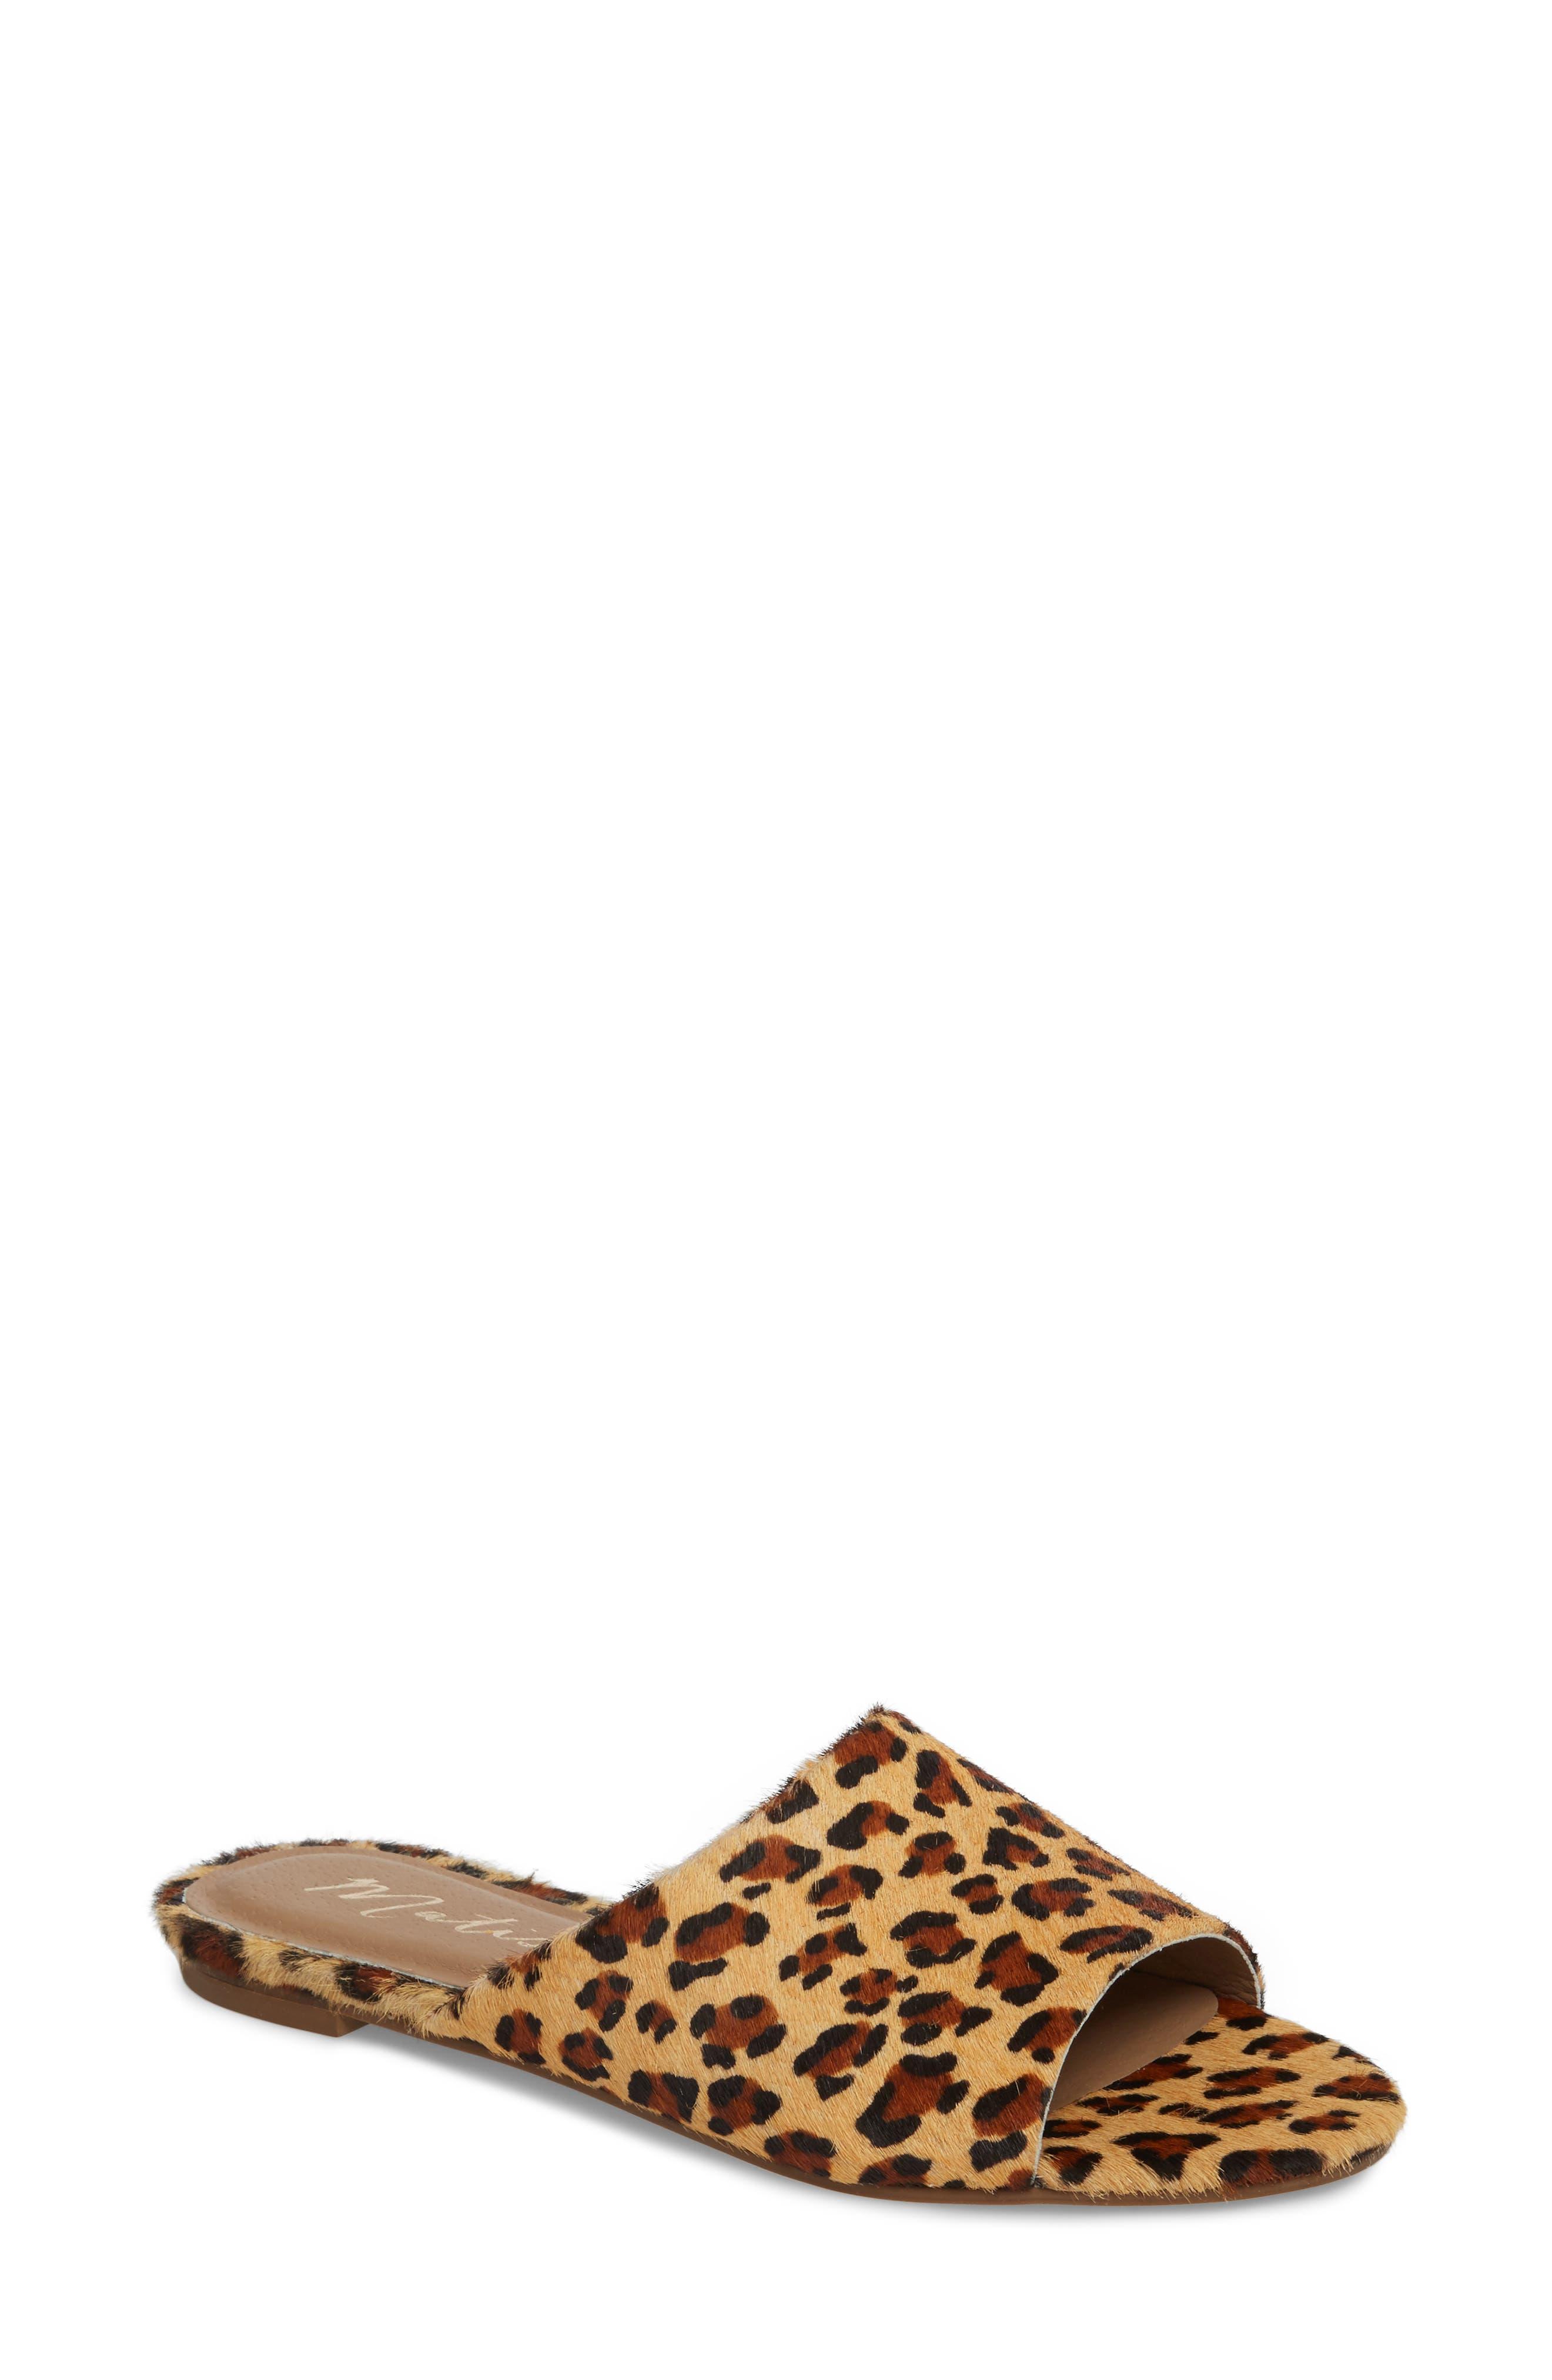 Lira Genuine Calf Hair Sandal,                             Main thumbnail 1, color,                             LEOPARD LEATHER